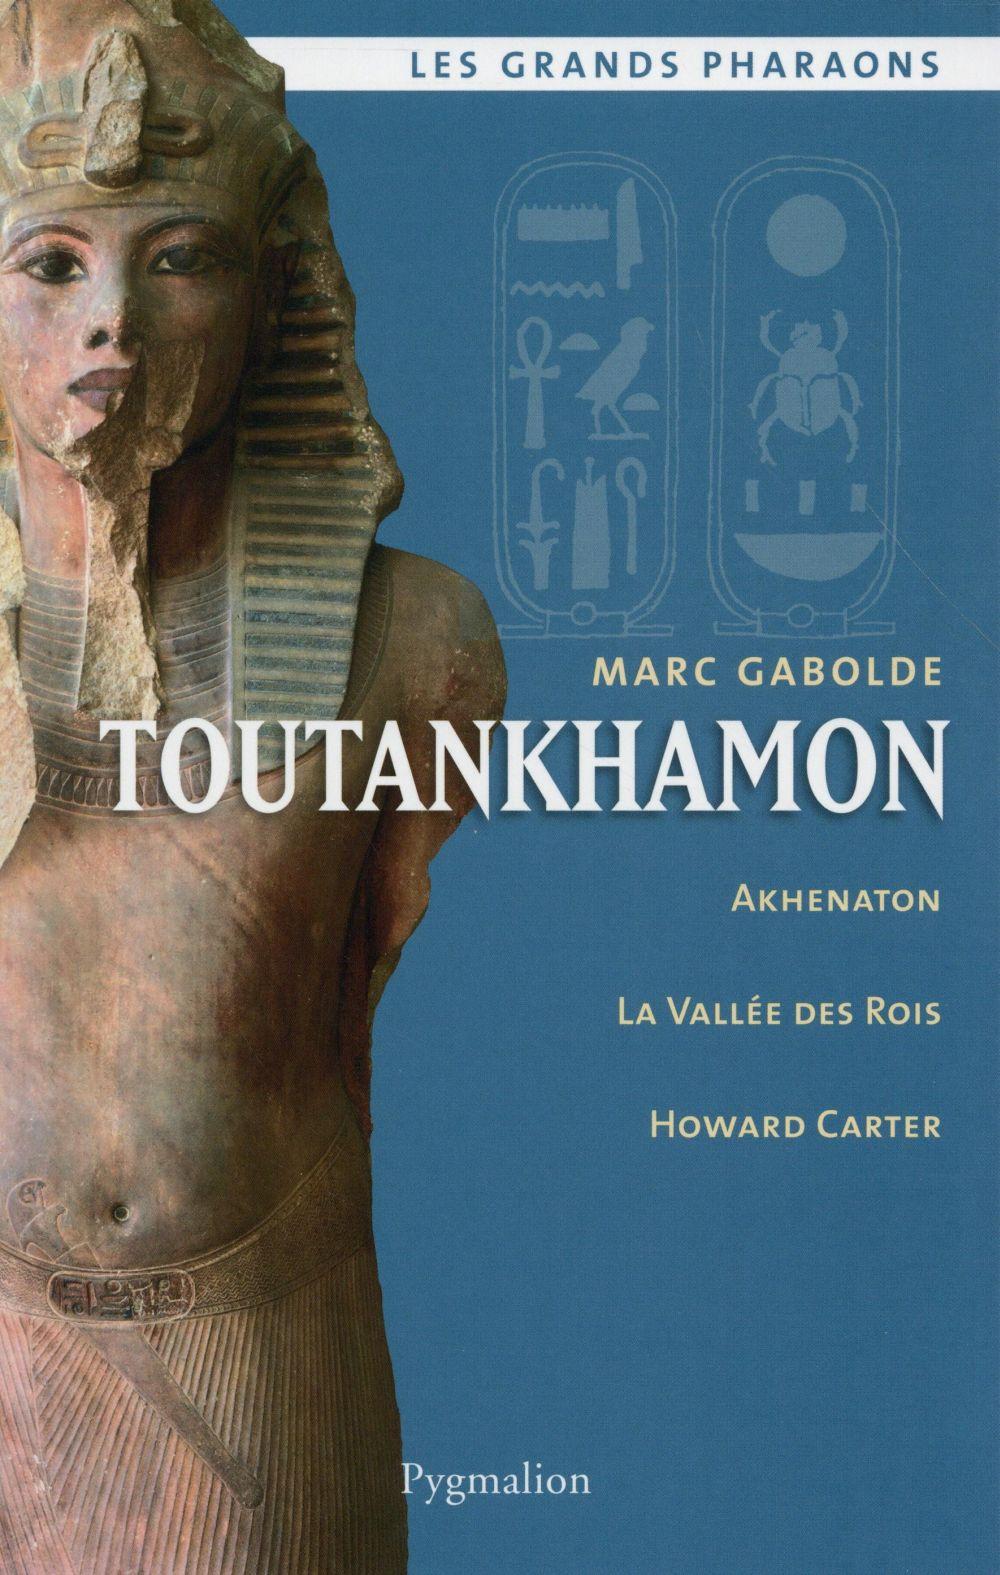 TOUTANKHAMON Gabolde Marc Pygmalion